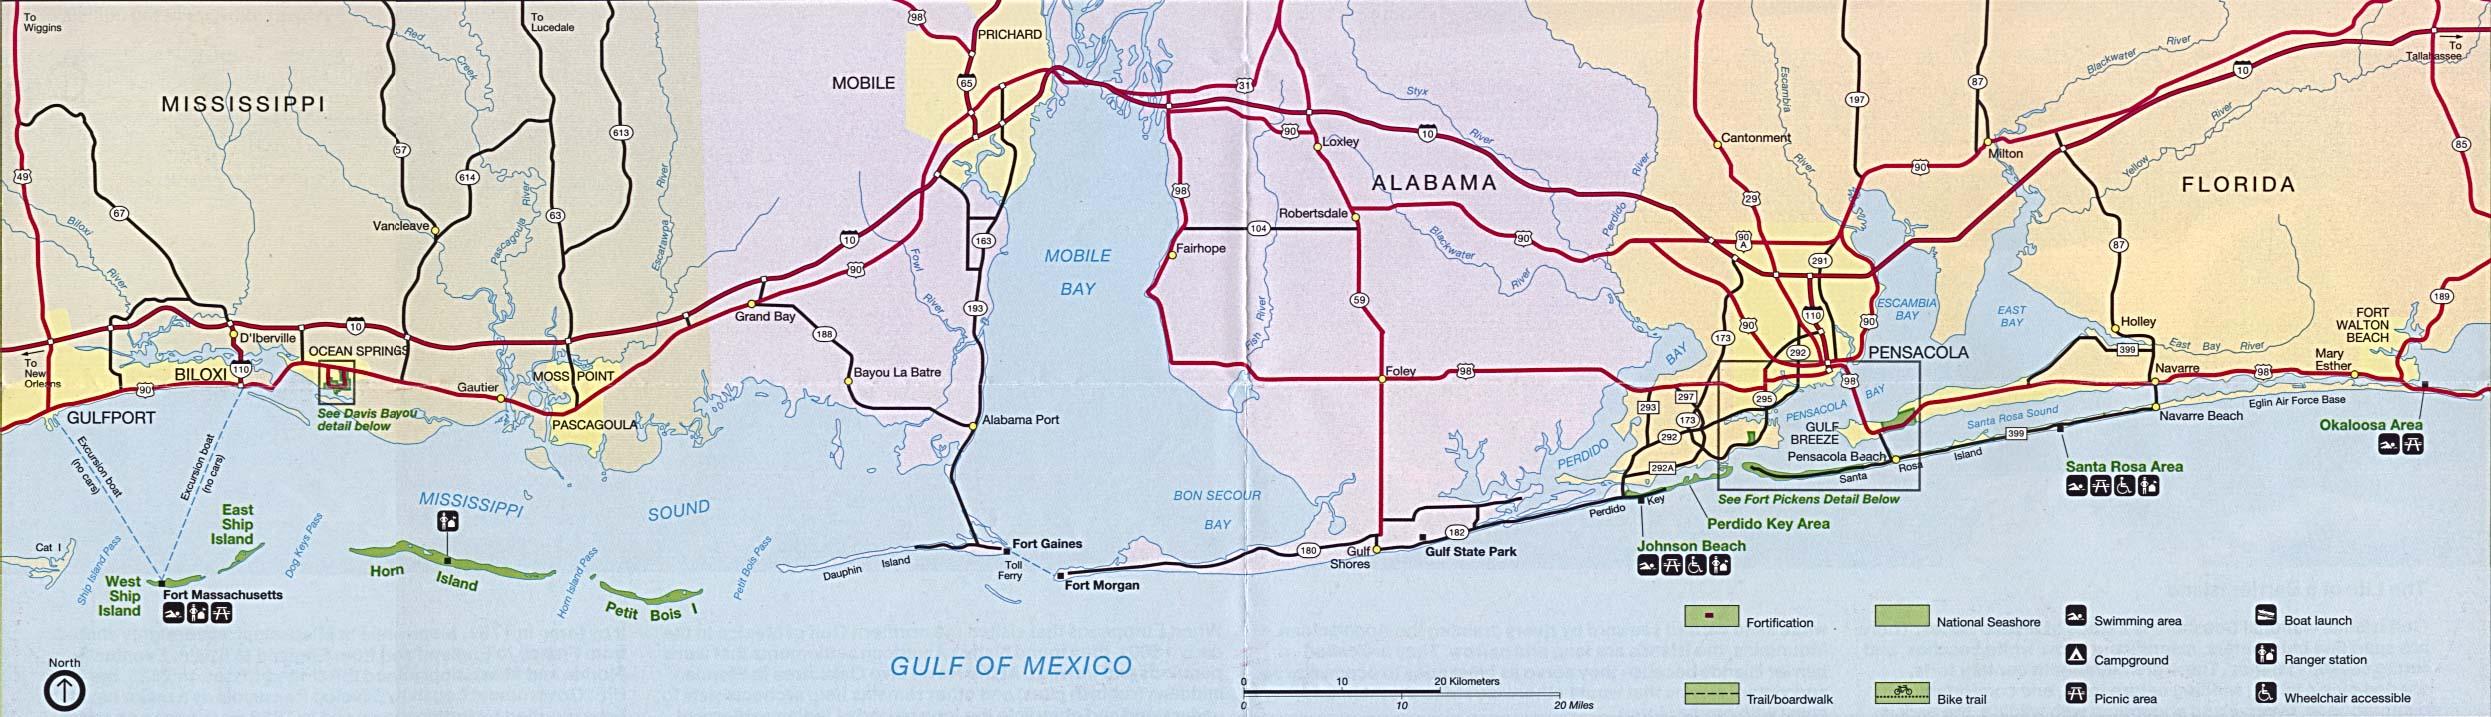 Map Of Alabama And Florida.Free Download Florida National Park Maps